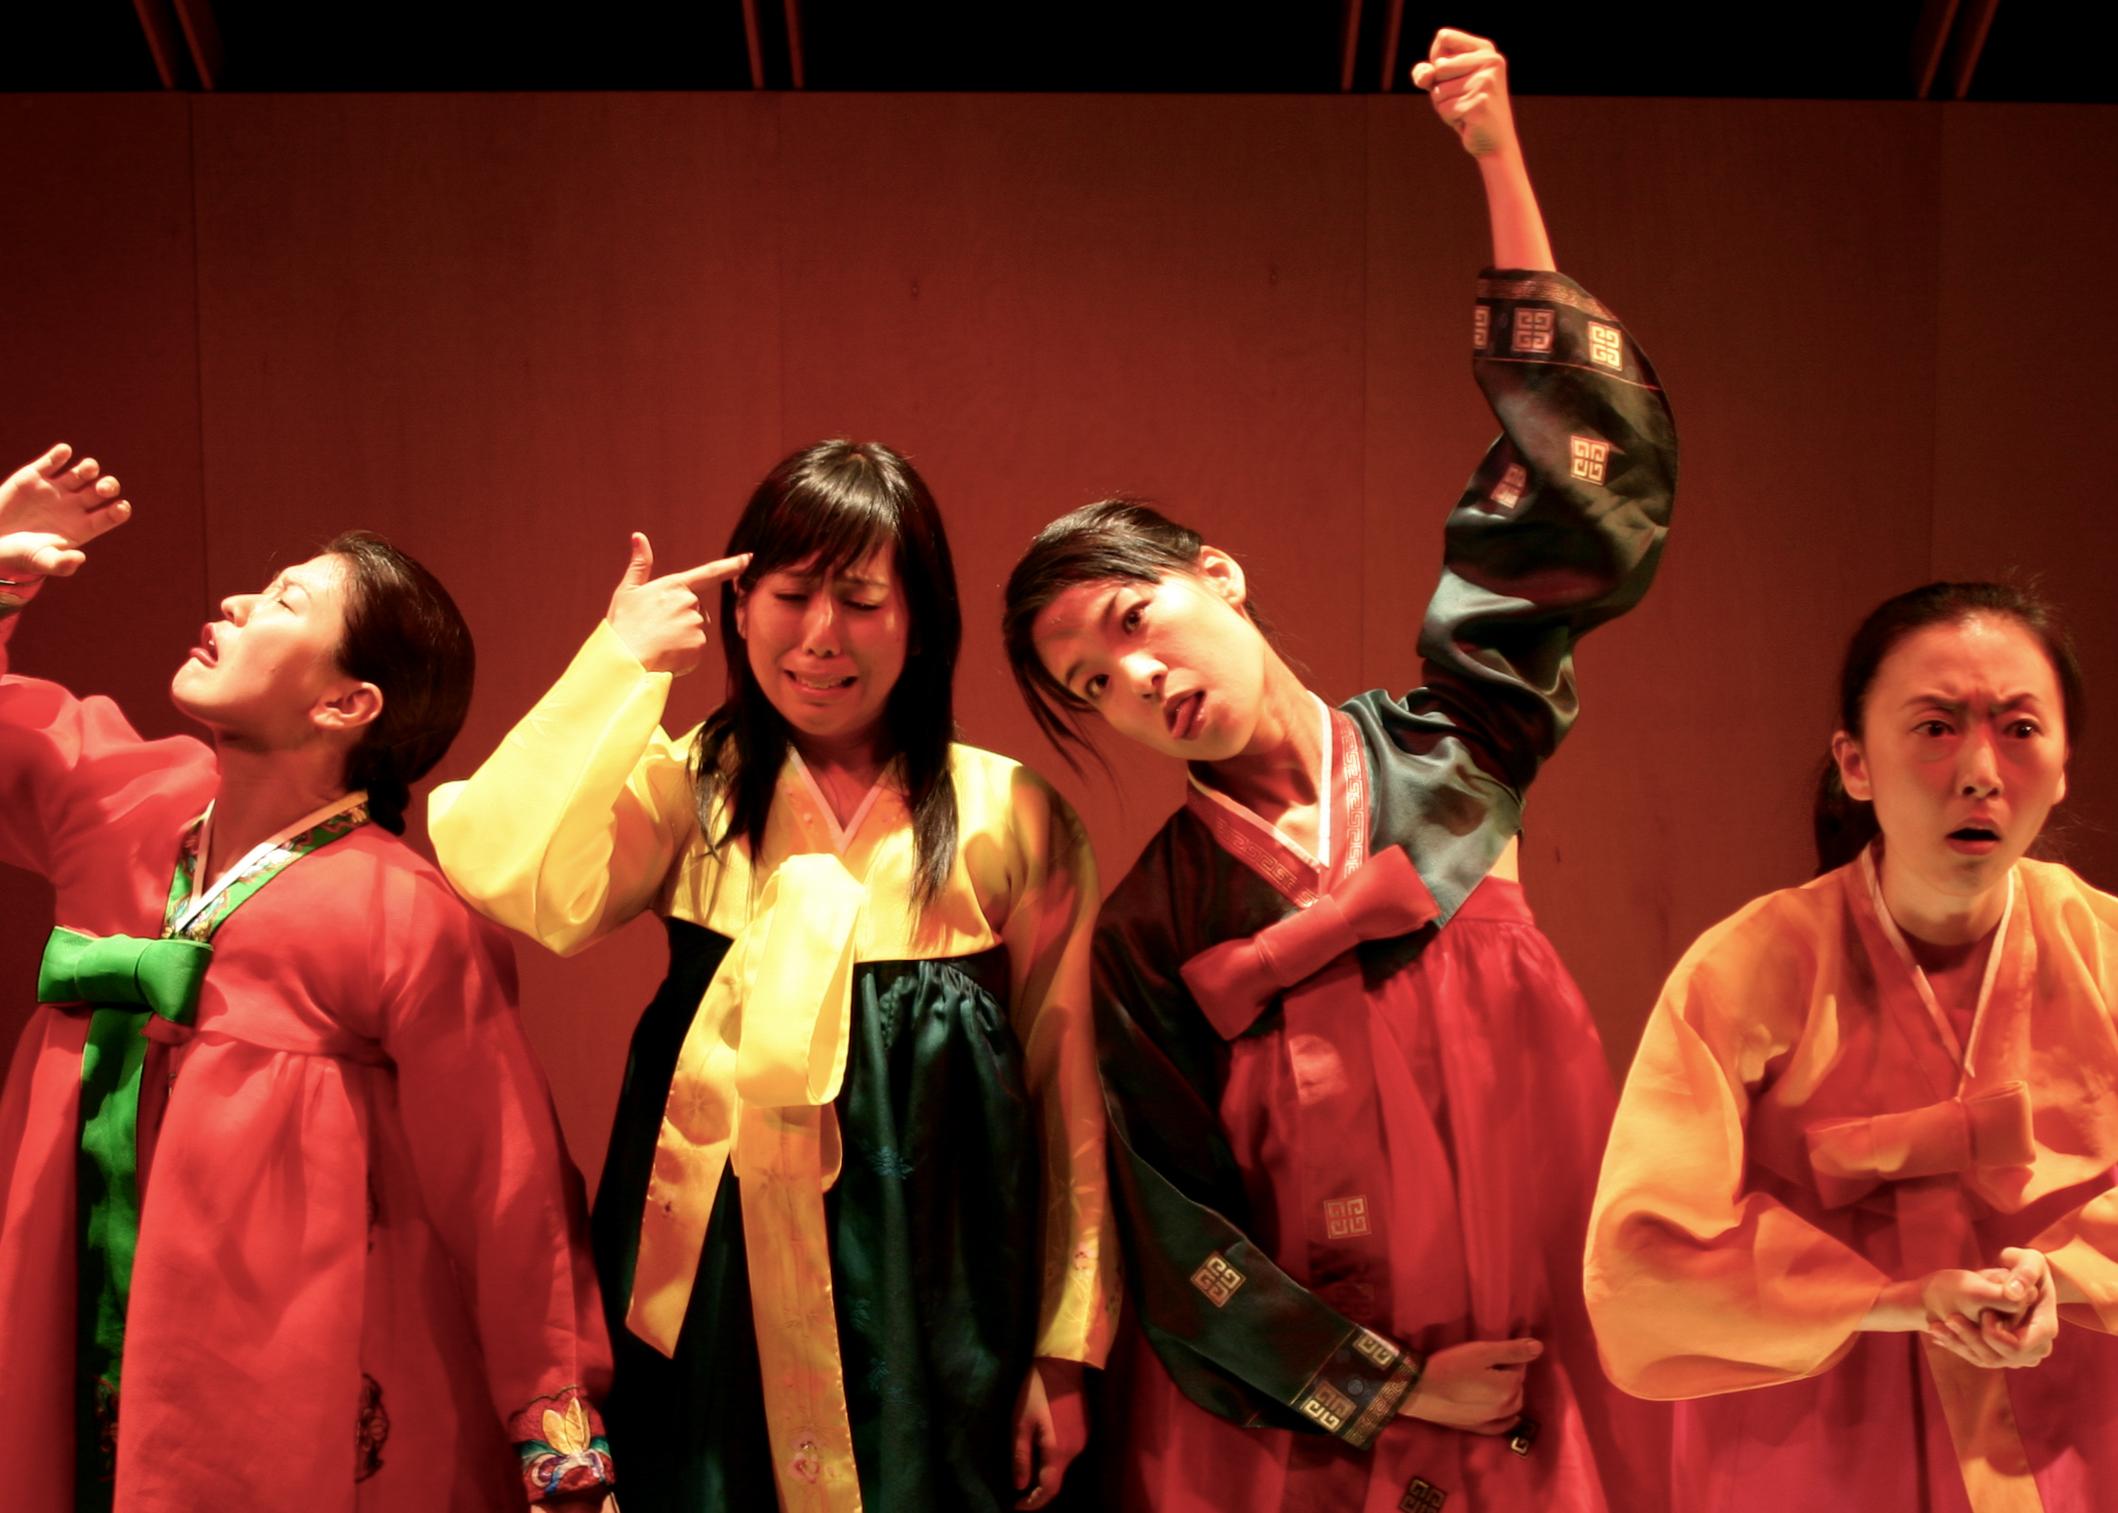 """Songs of the Dragons Flying to Heaven"", HERE Arts Center, New York, NY Jennifer Lim, Becky Yamamoto, Jun Sky Kim, Haerry Kim. Courtesy of Carl Skutch."